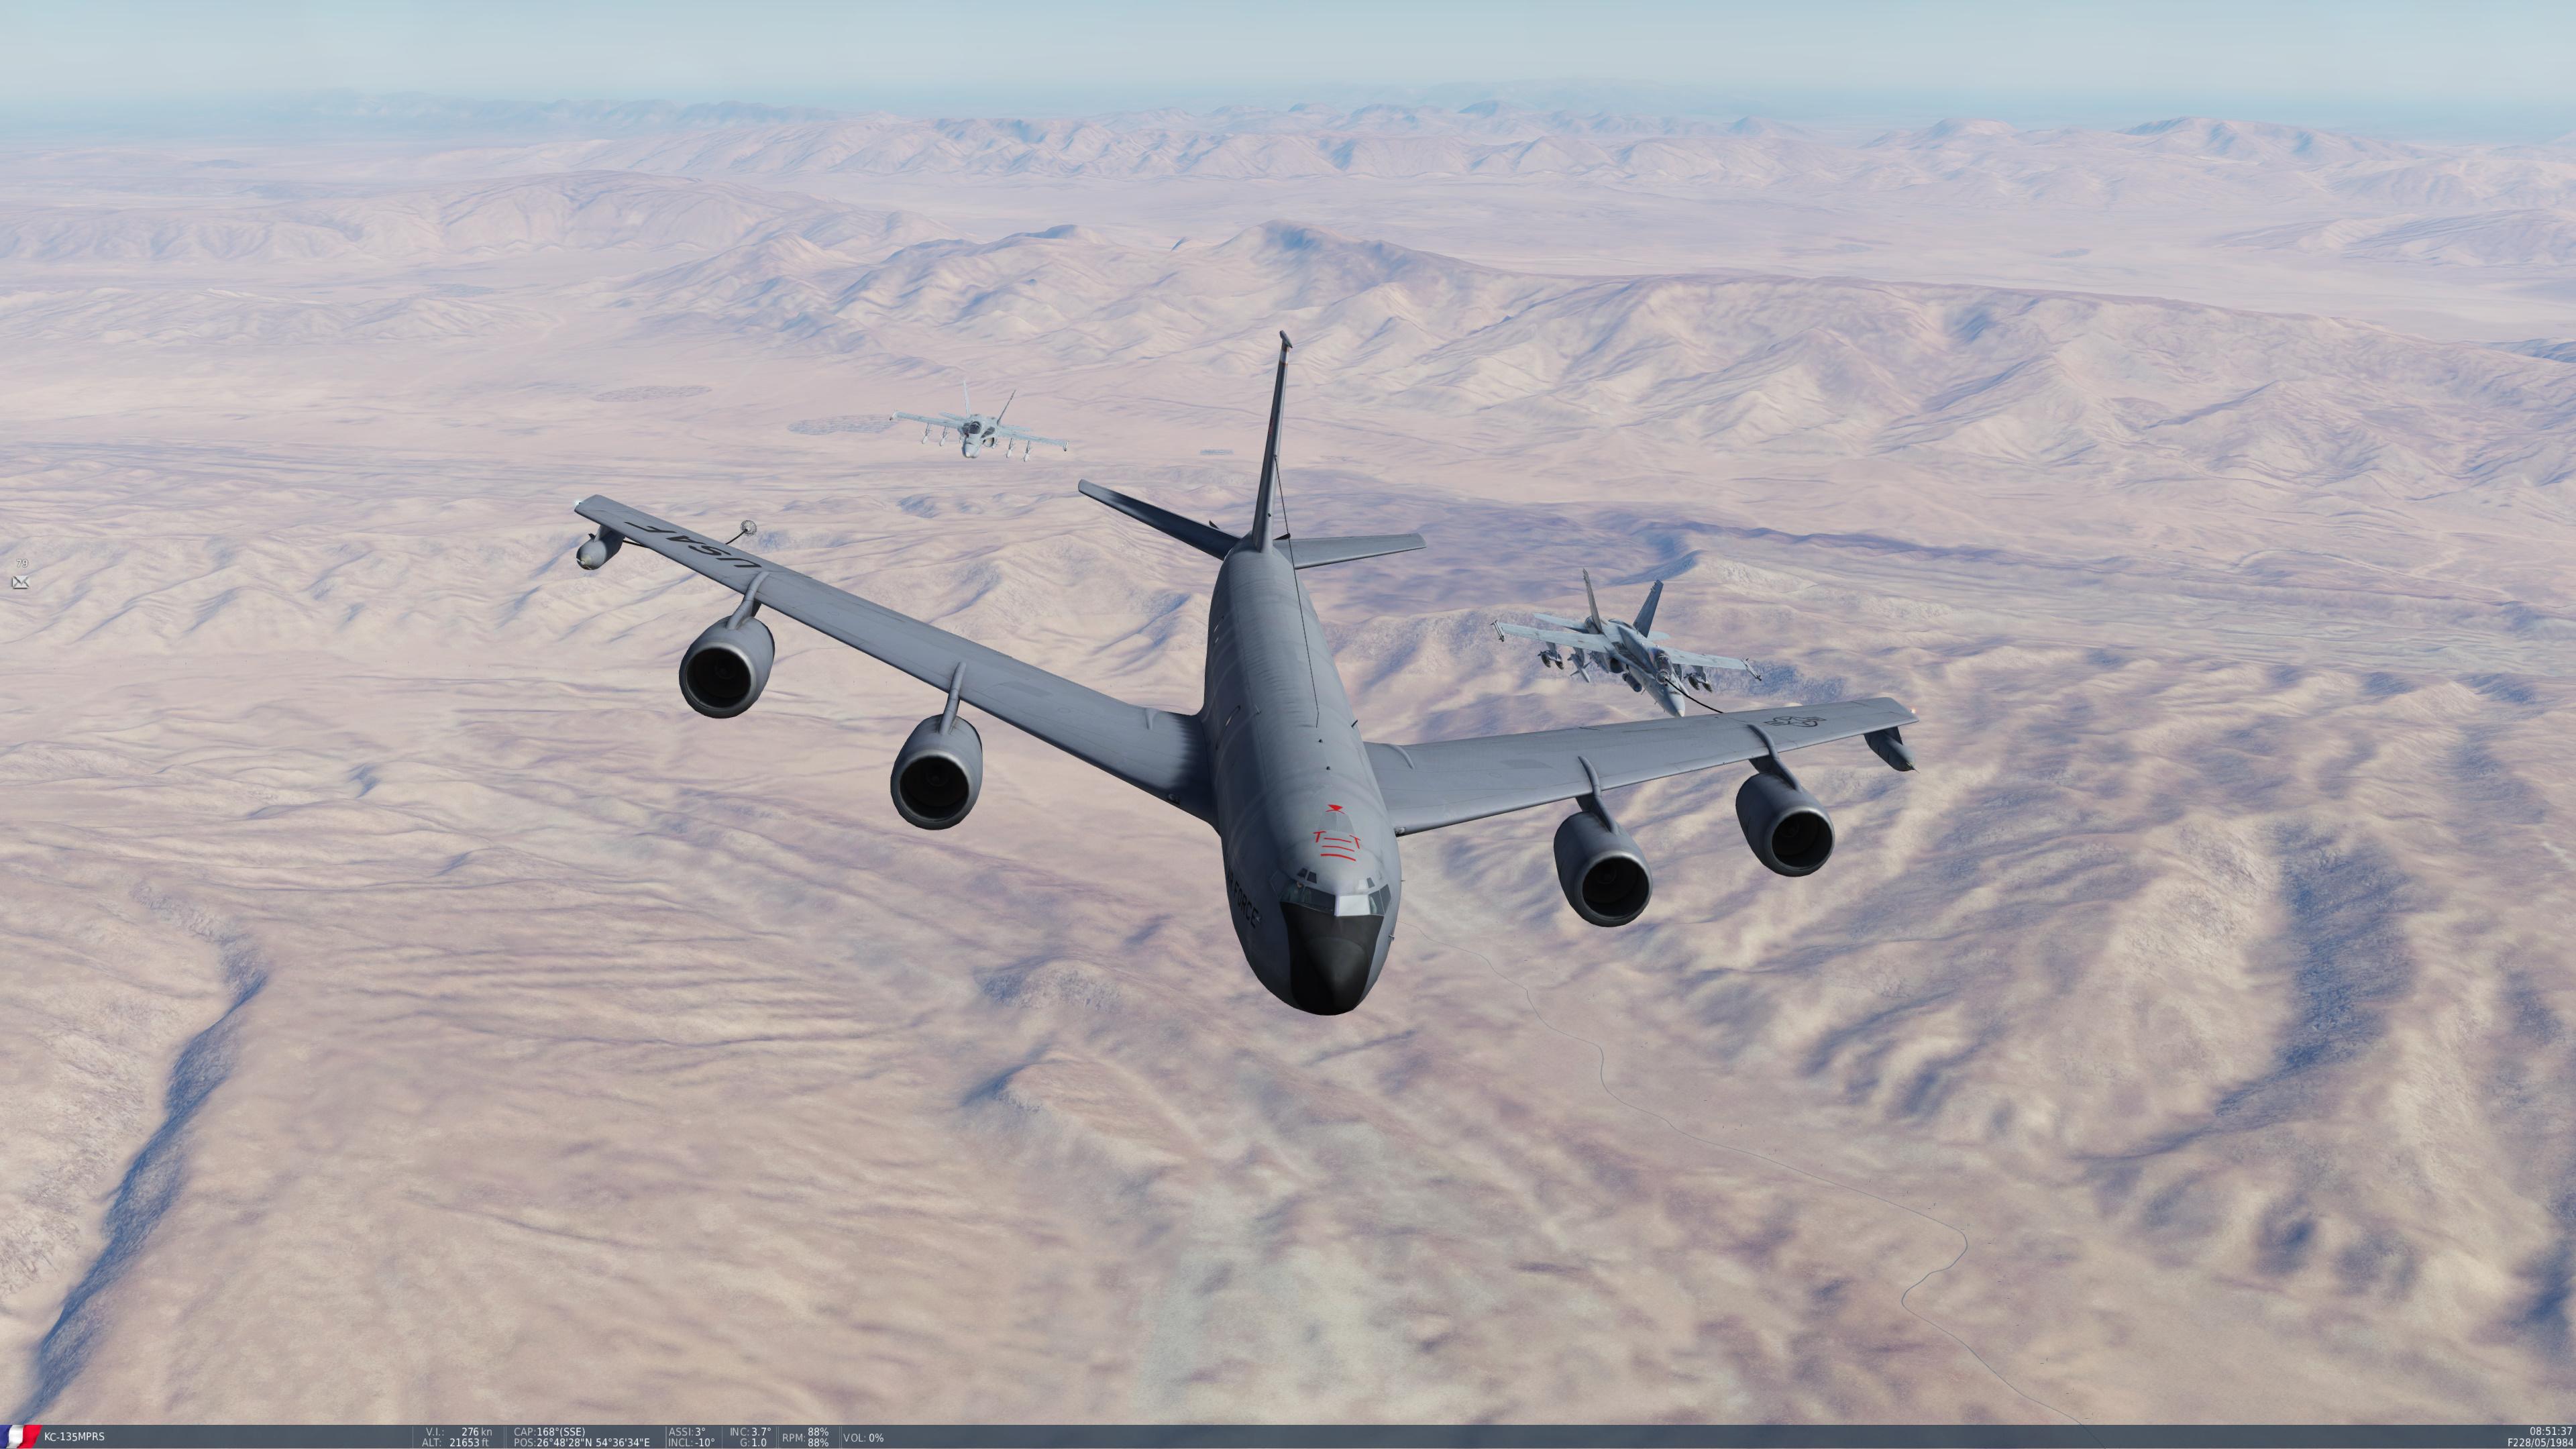 [Cursus UH-1H Huey] Photos de nos missions Bandicam_2021-01-26_22-58-27-838